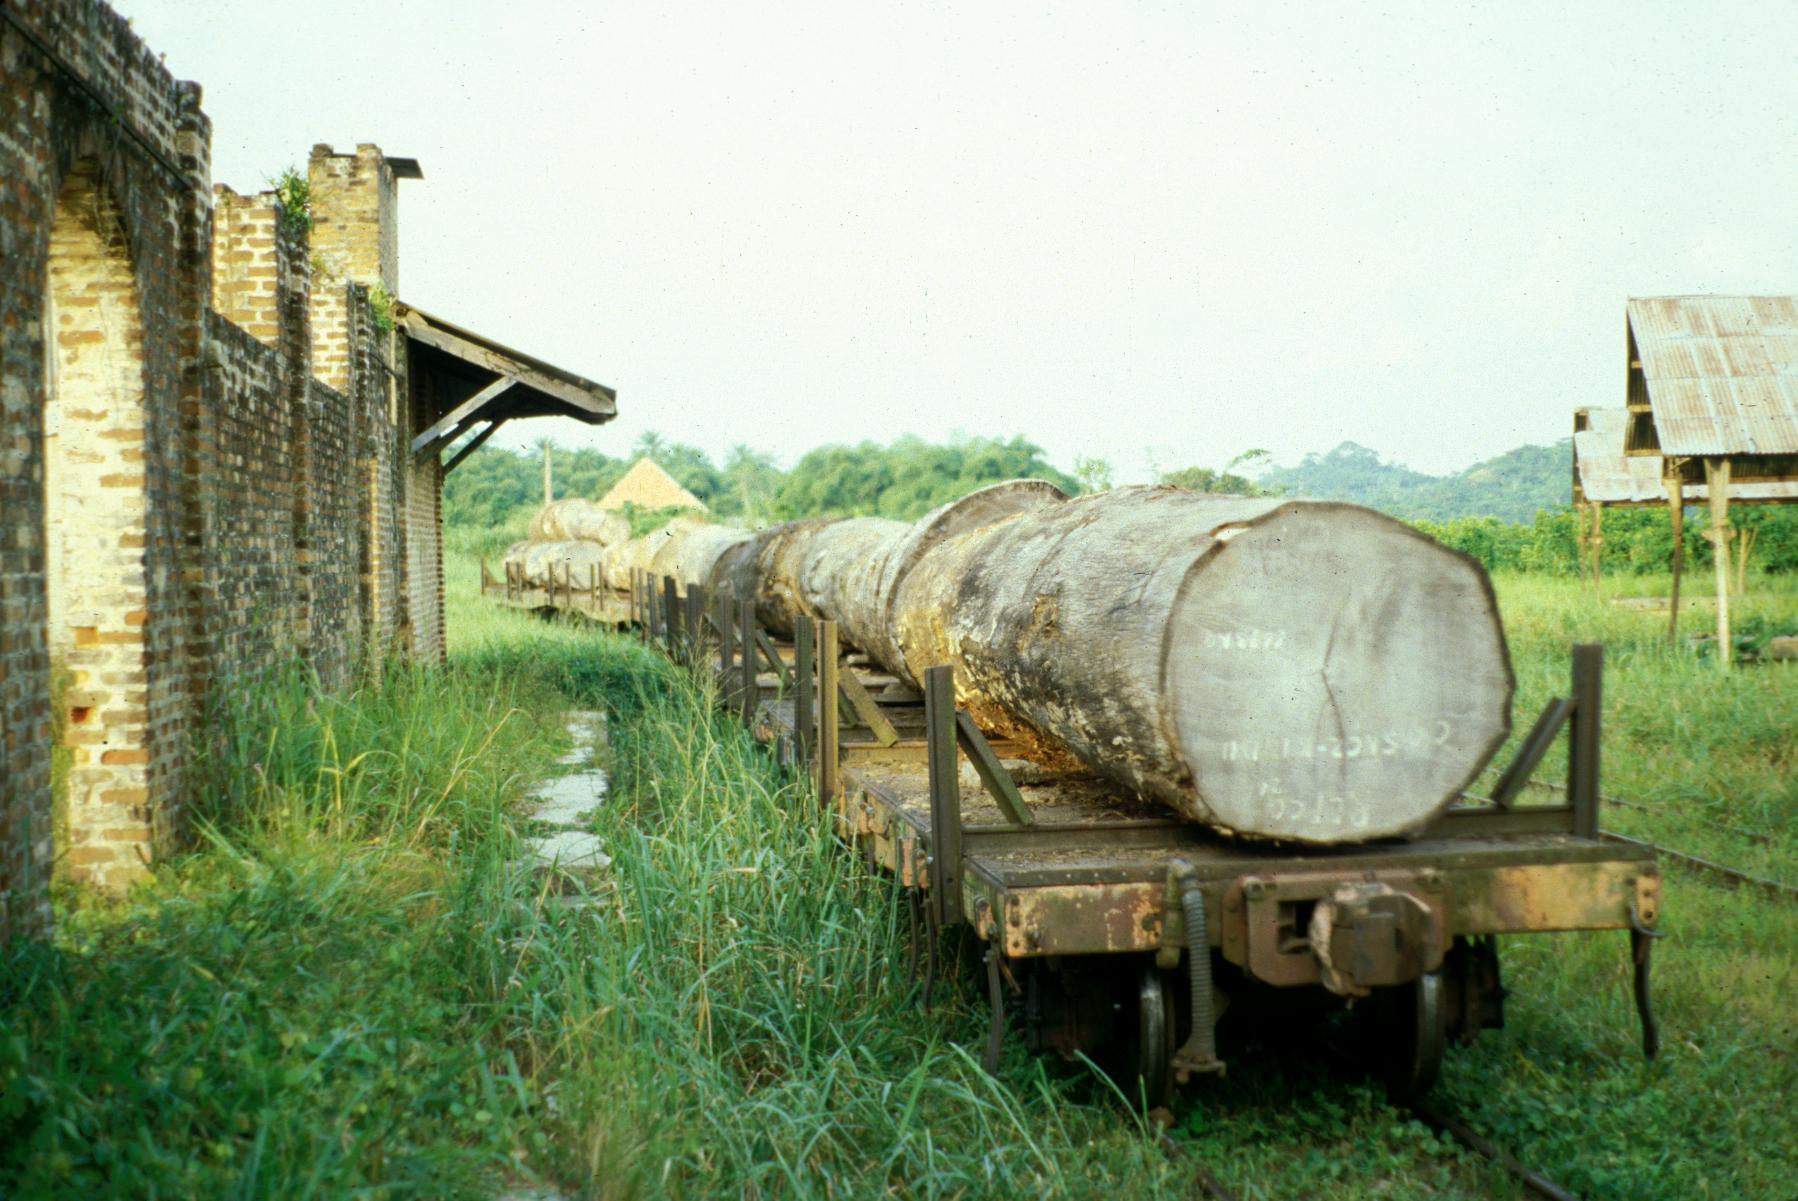 Hardwoods Loaded on Train